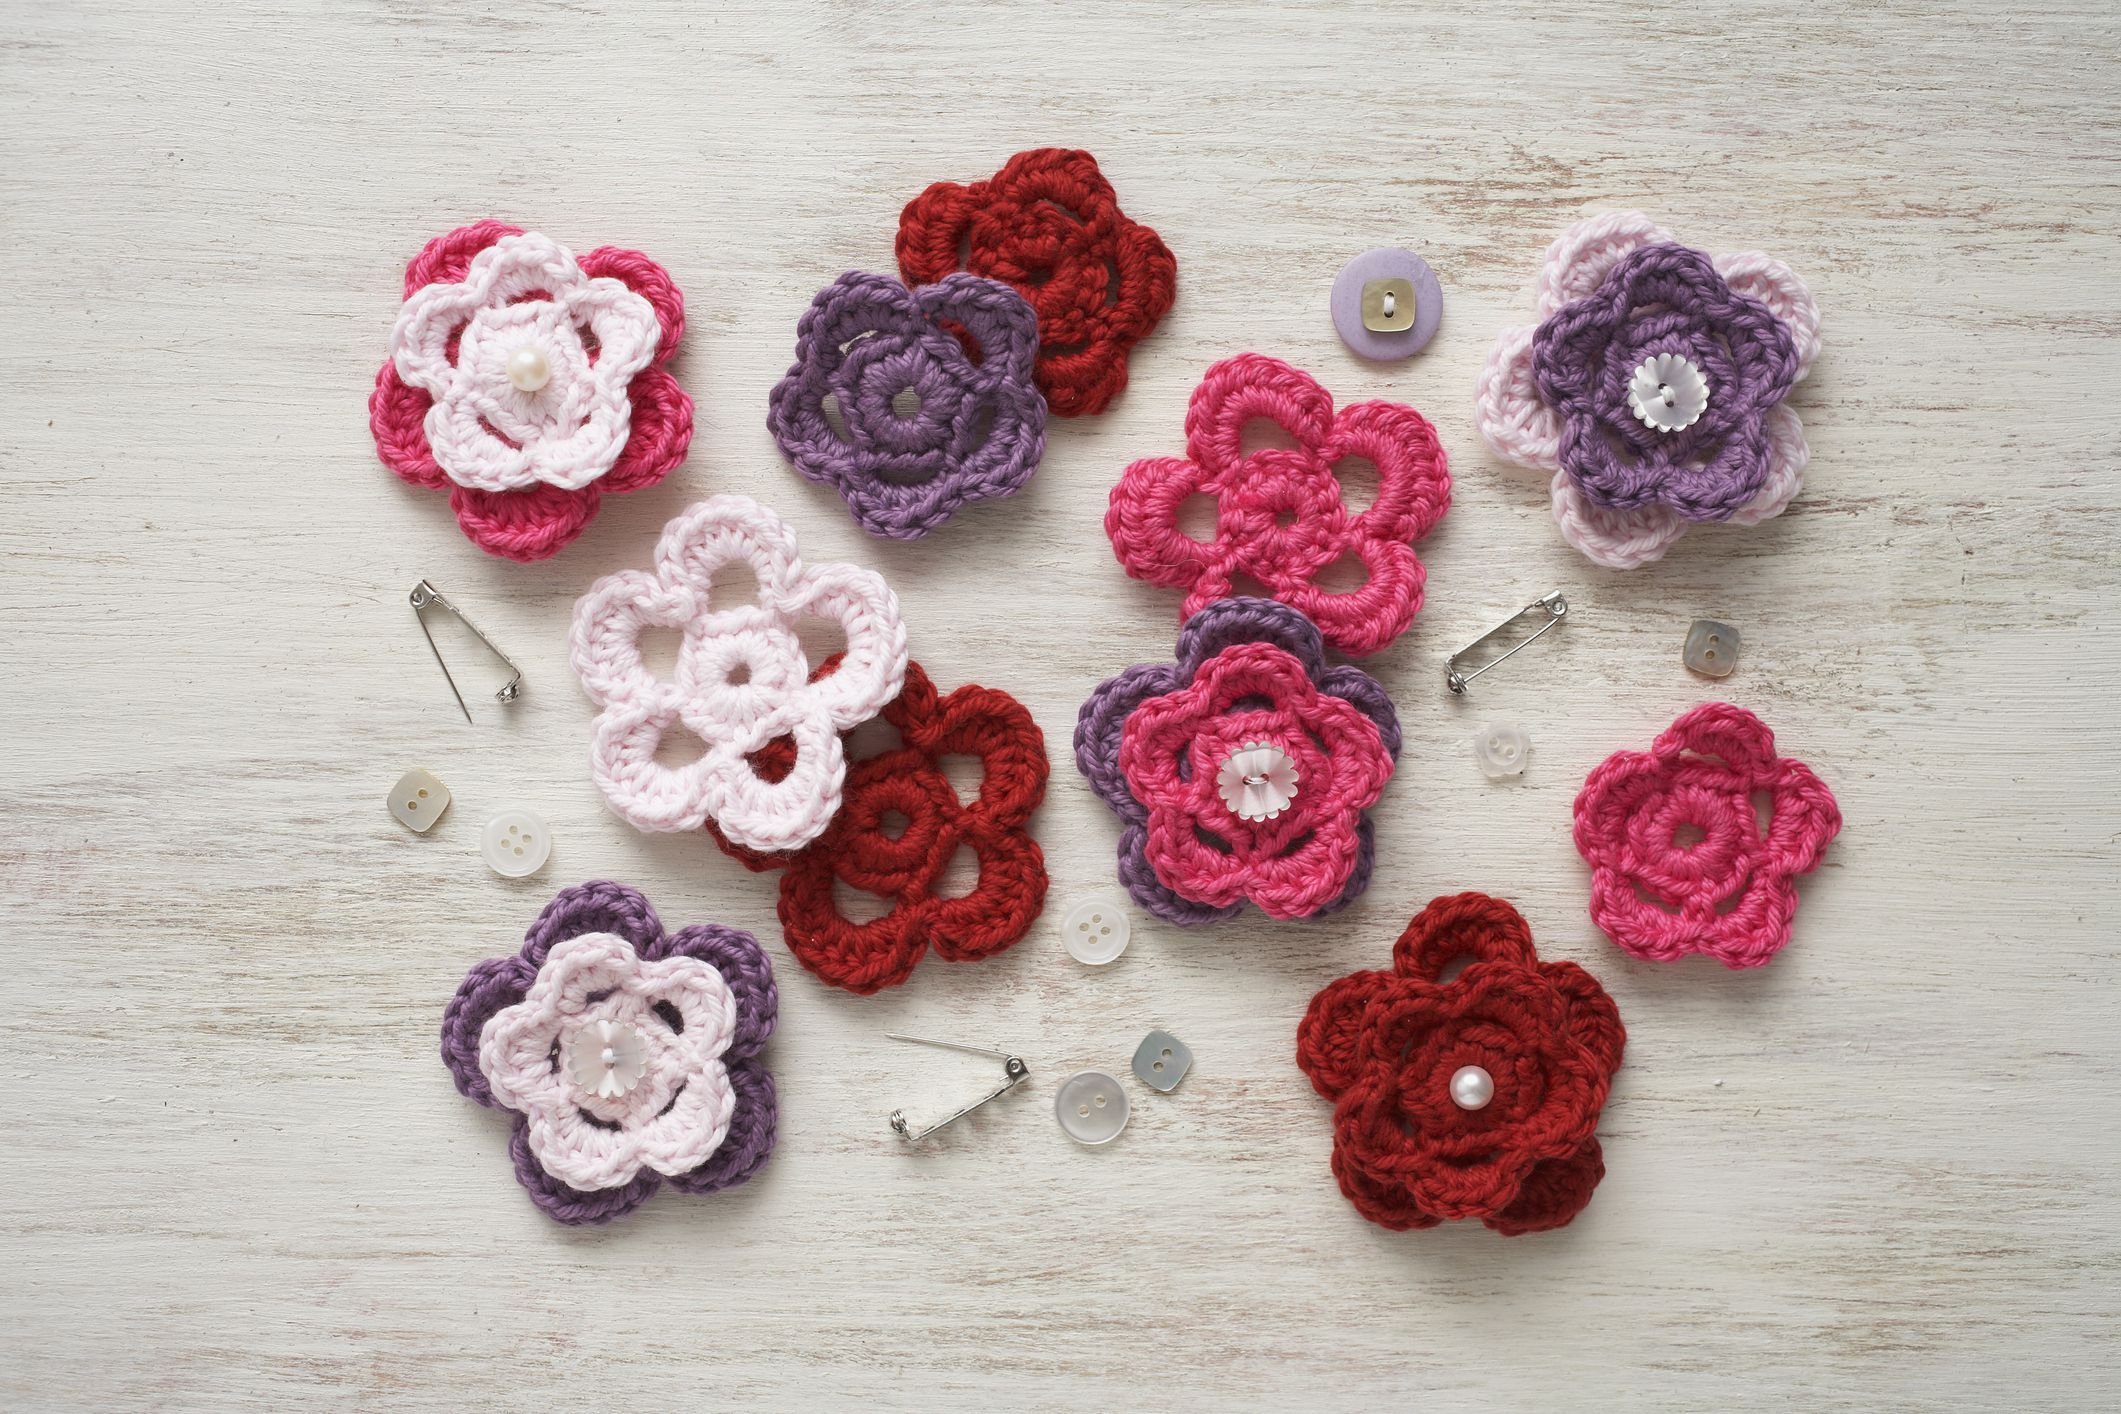 Free crochet bedspread patterns 60 free crochet flower patterns for every season of the year bankloansurffo Images